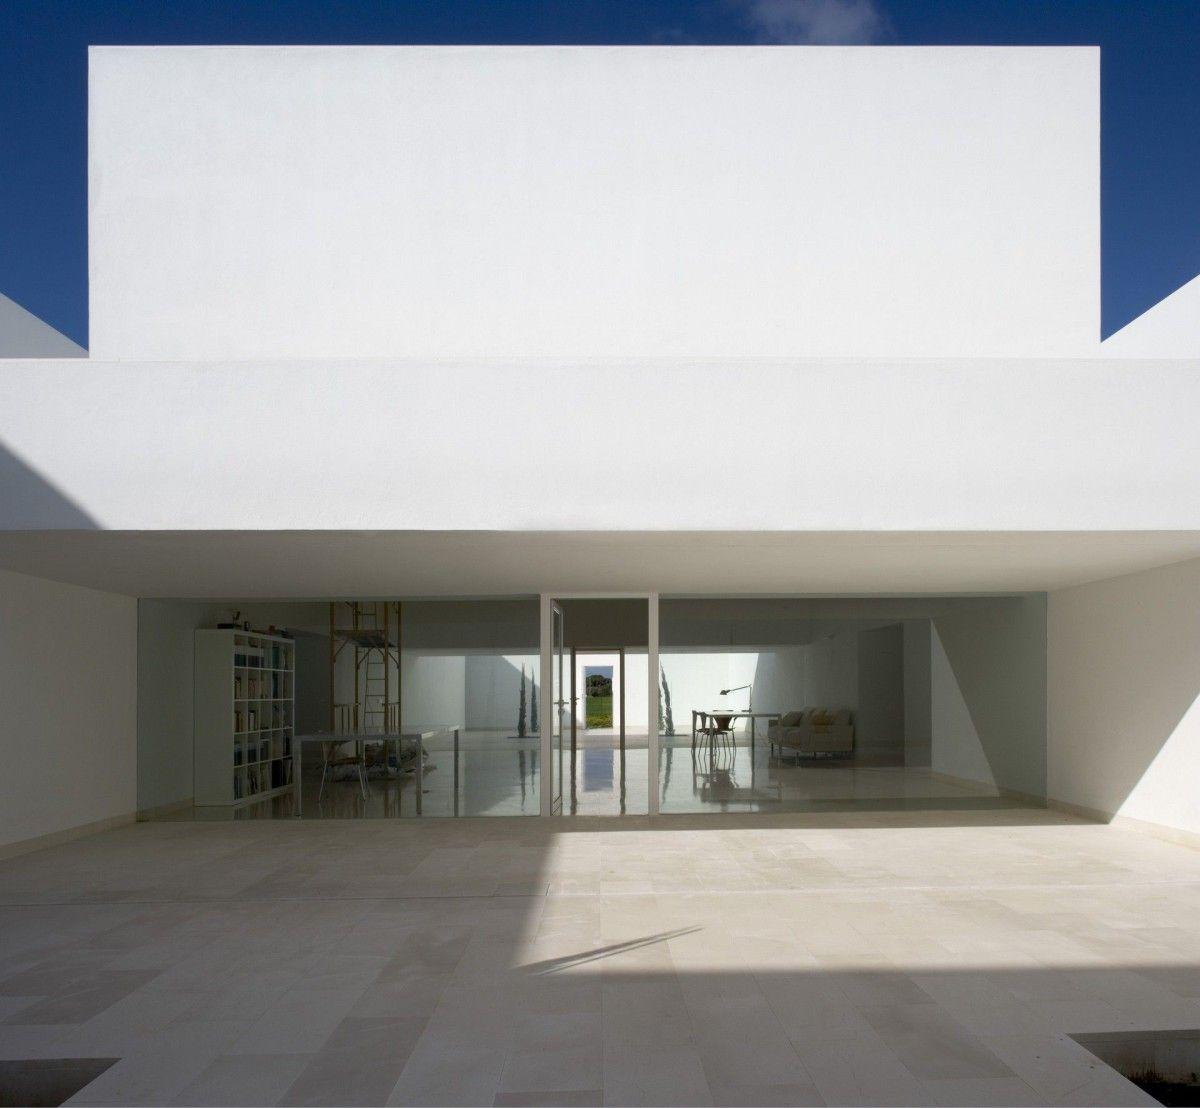 24+ De blas house alberto campo baeza ideas in 2021